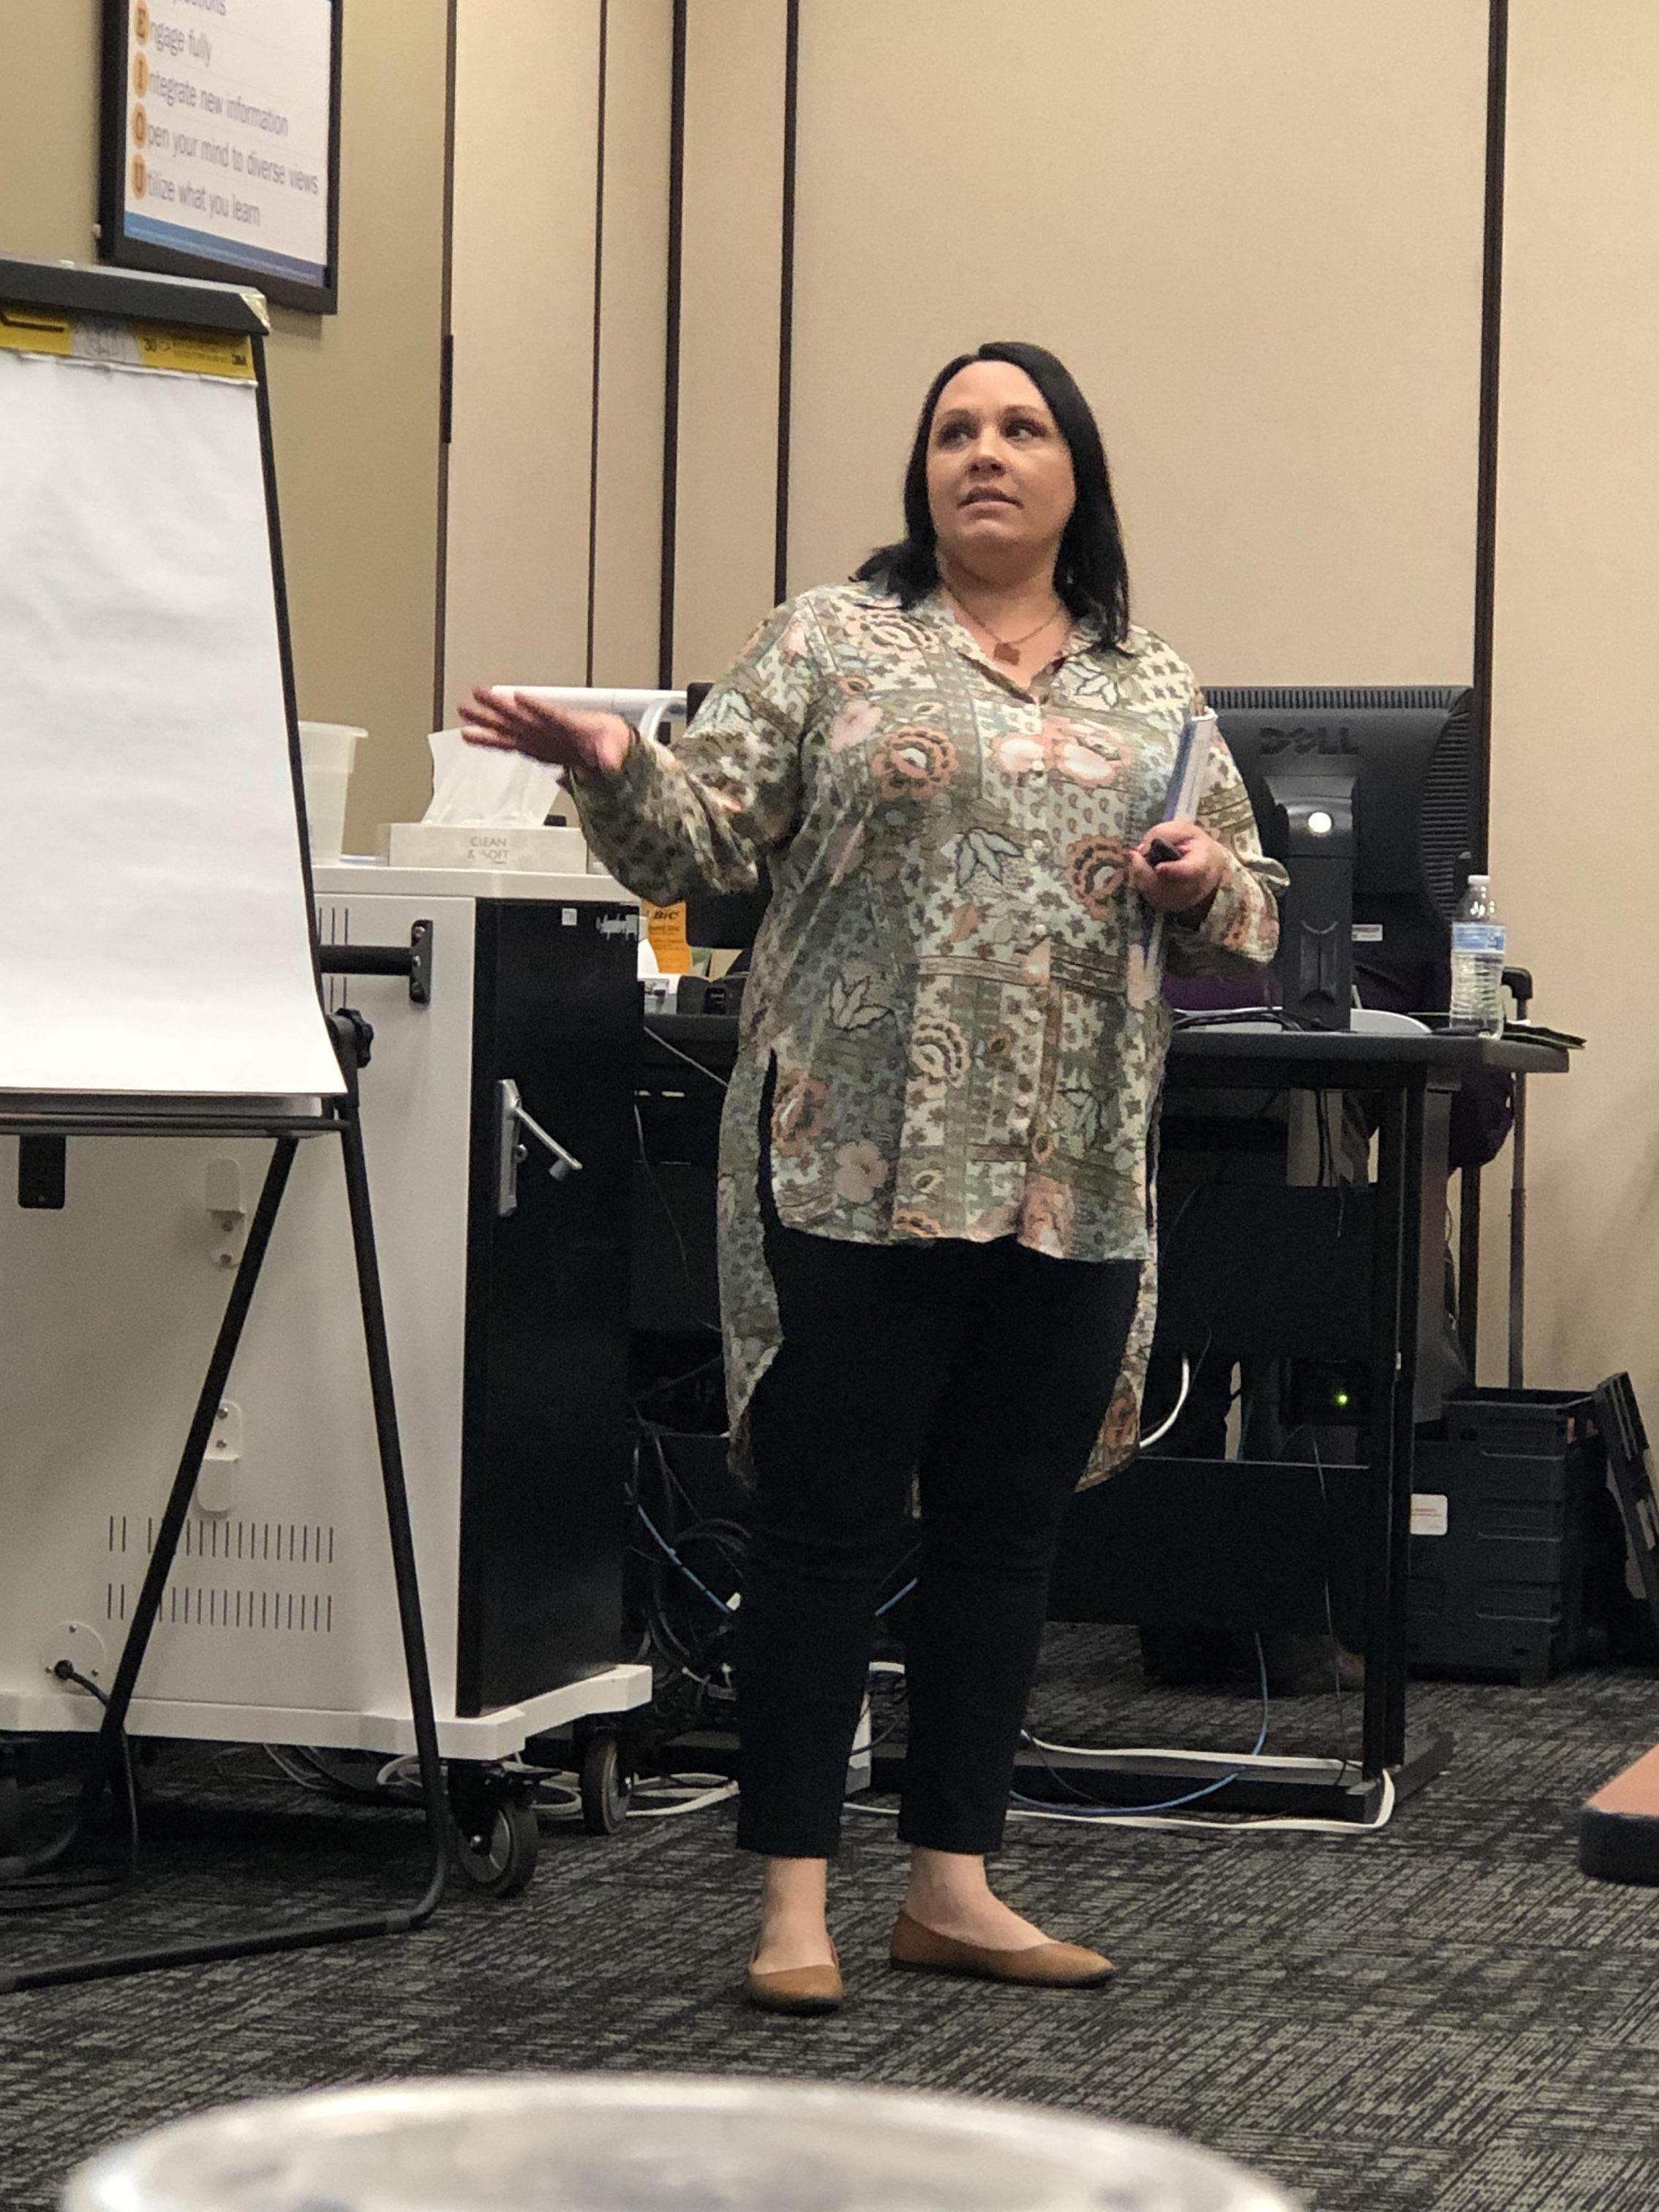 April Jones, LMFT providing a Youth Mental Health Aid First Training